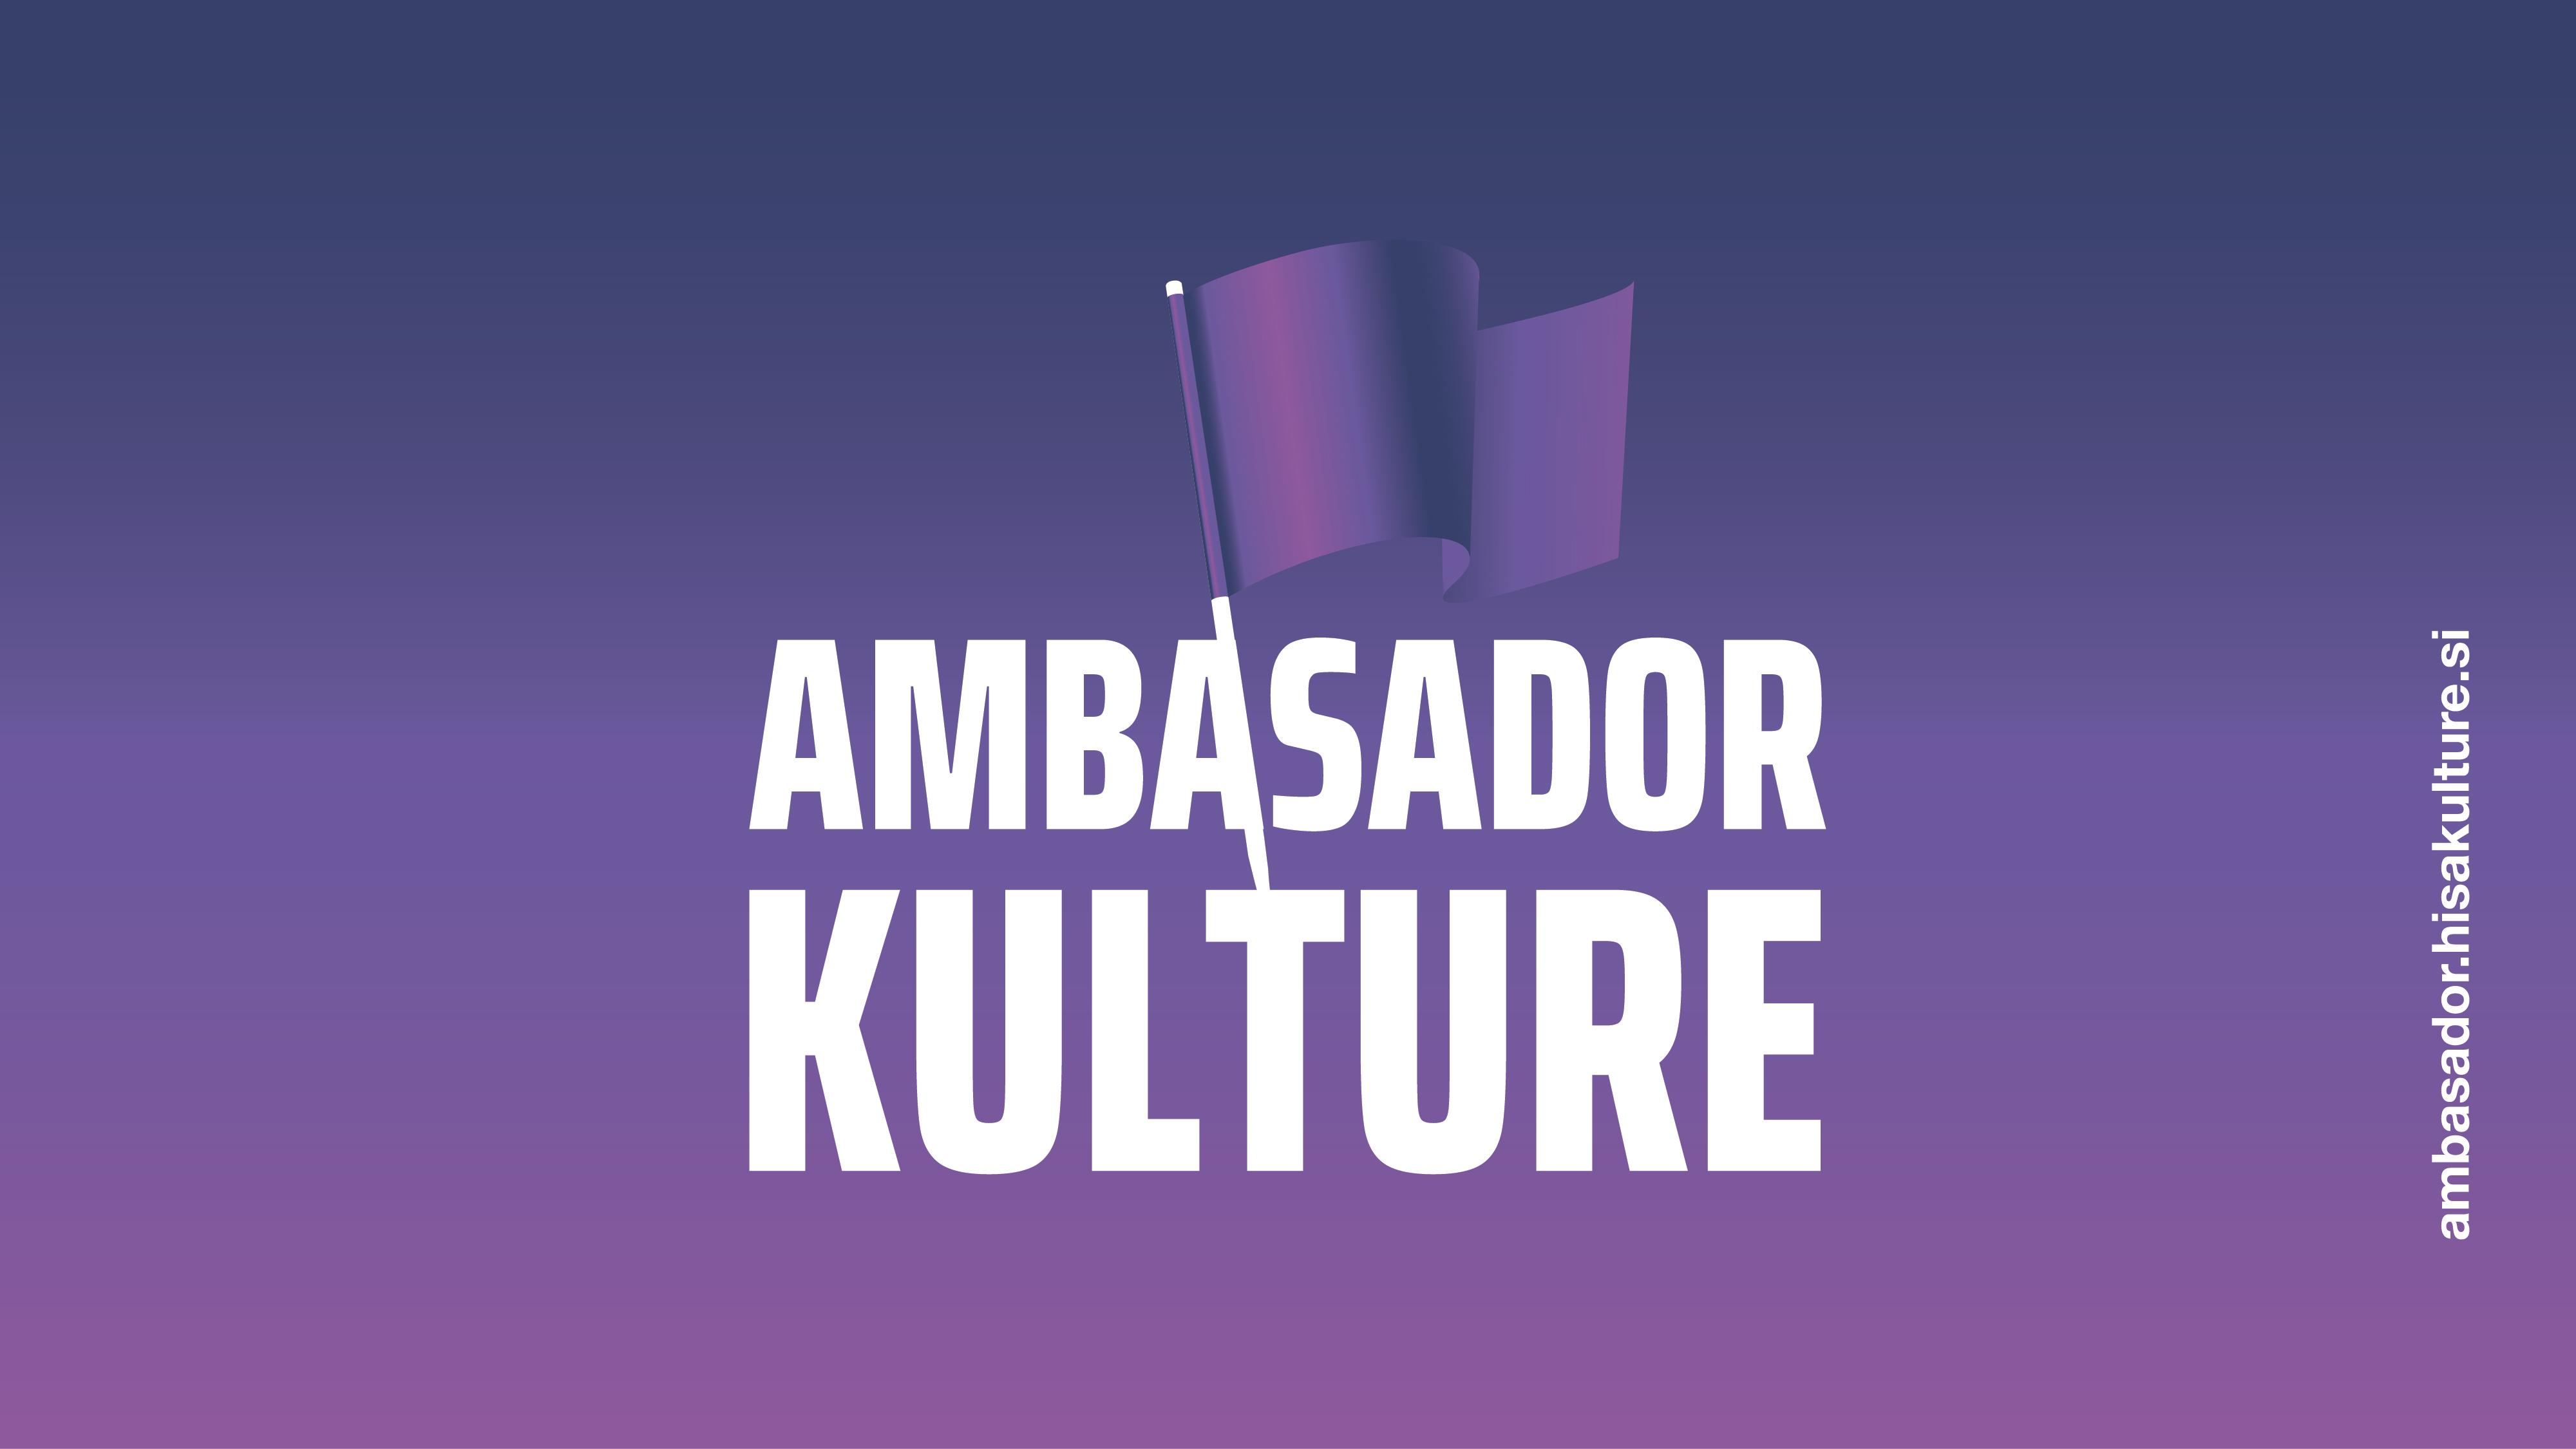 Ambasador kulture